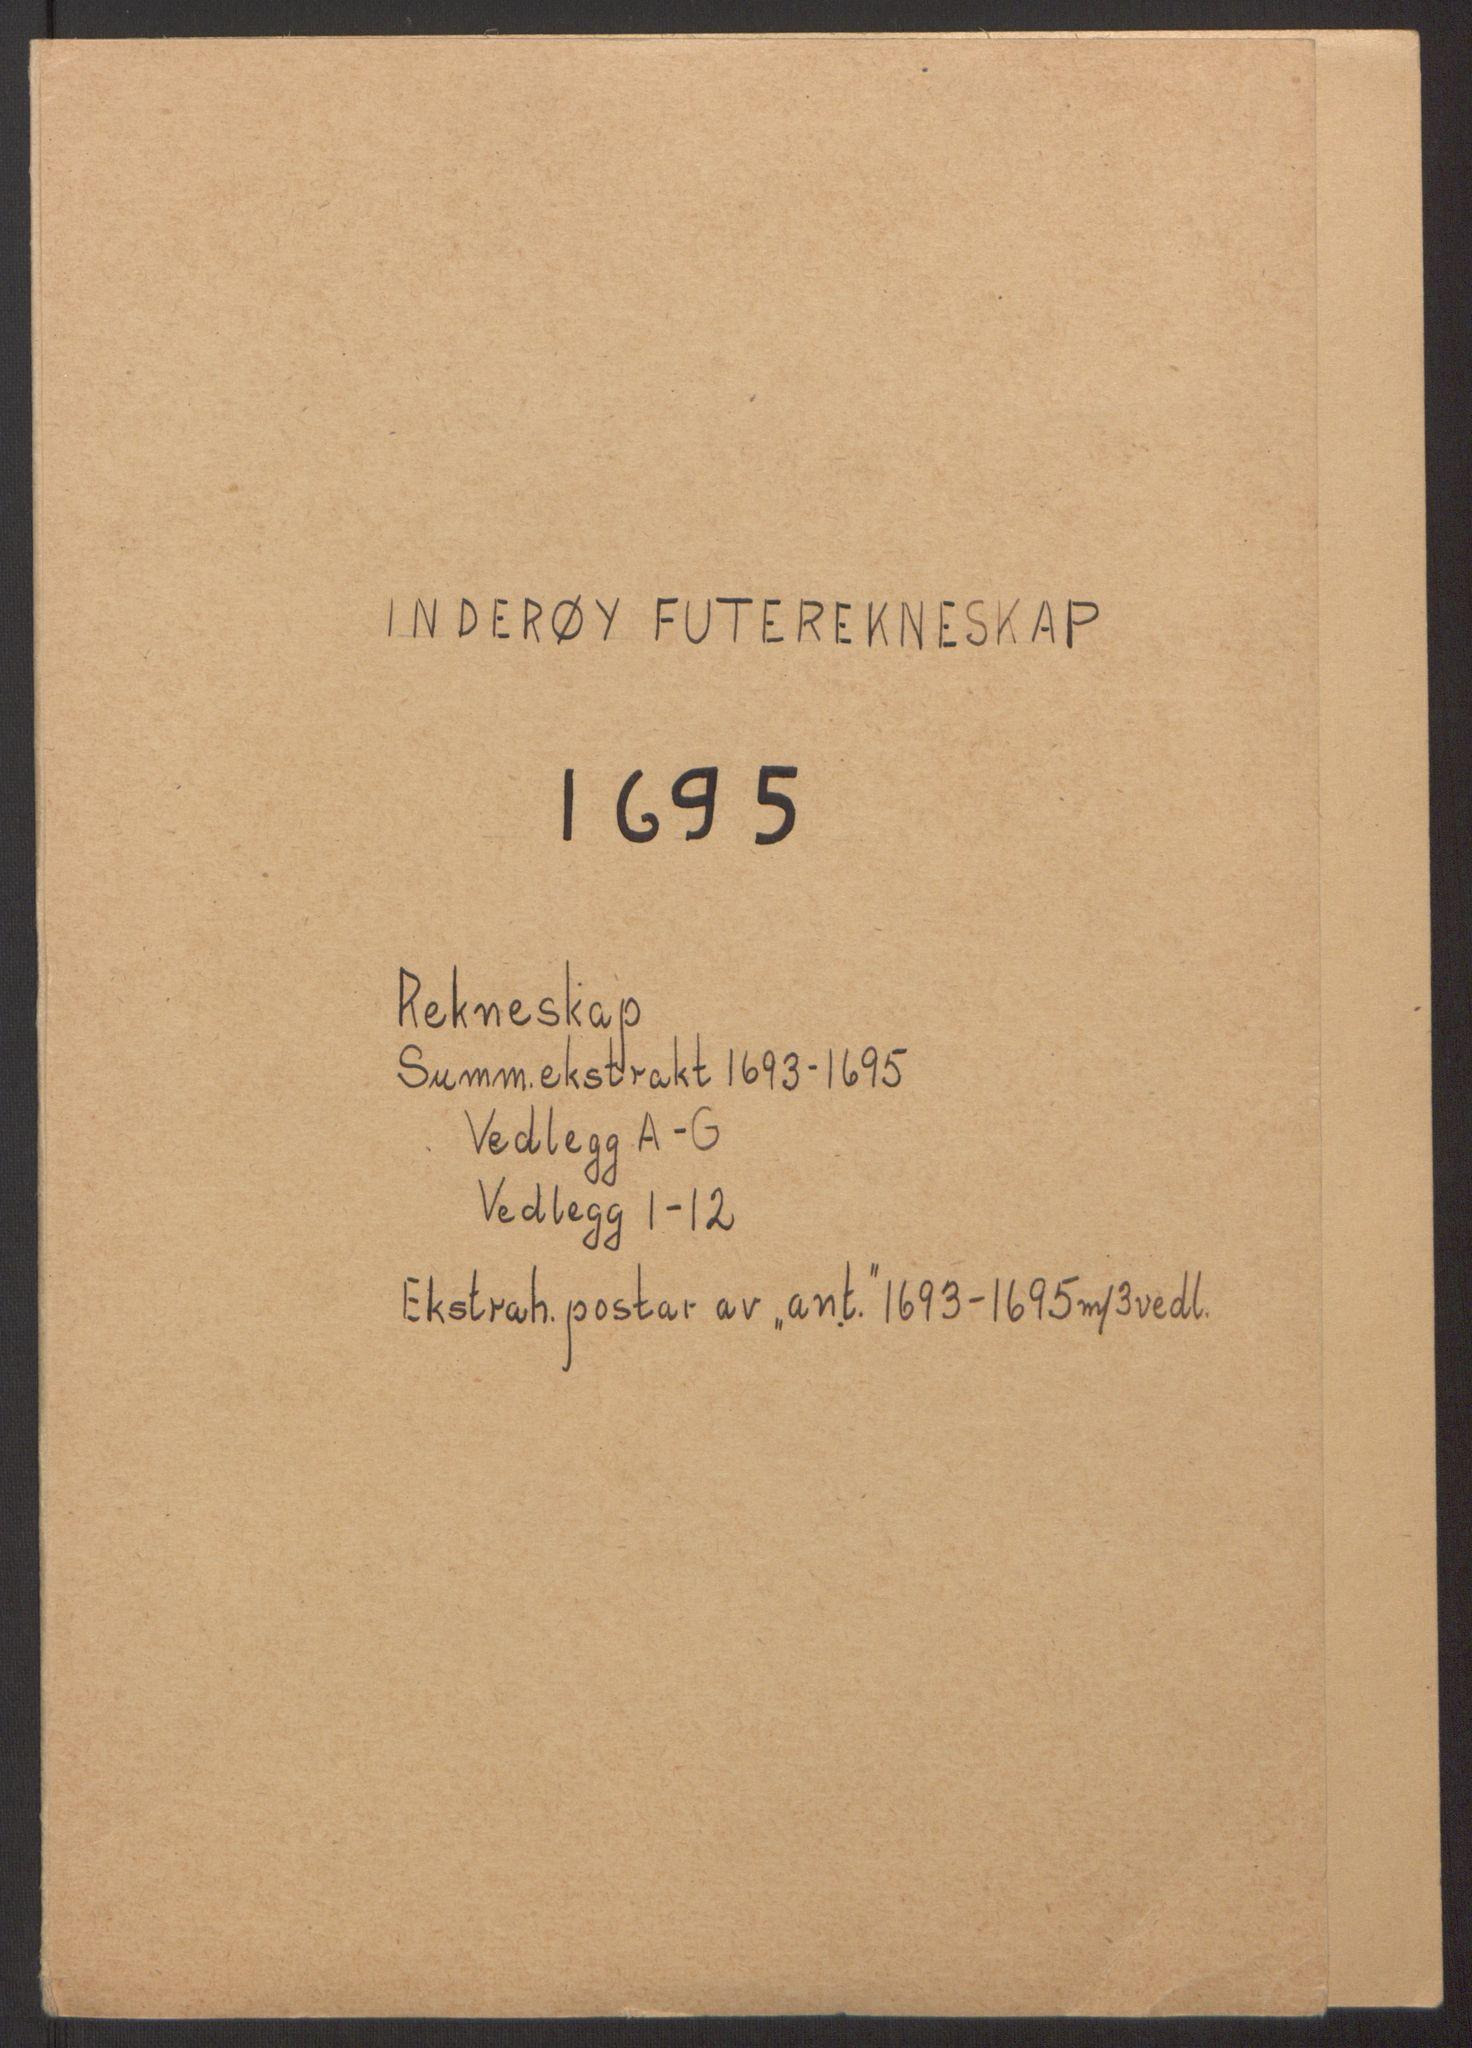 RA, Rentekammeret inntil 1814, Reviderte regnskaper, Fogderegnskap, R63/L4309: Fogderegnskap Inderøy, 1695-1697, s. 2